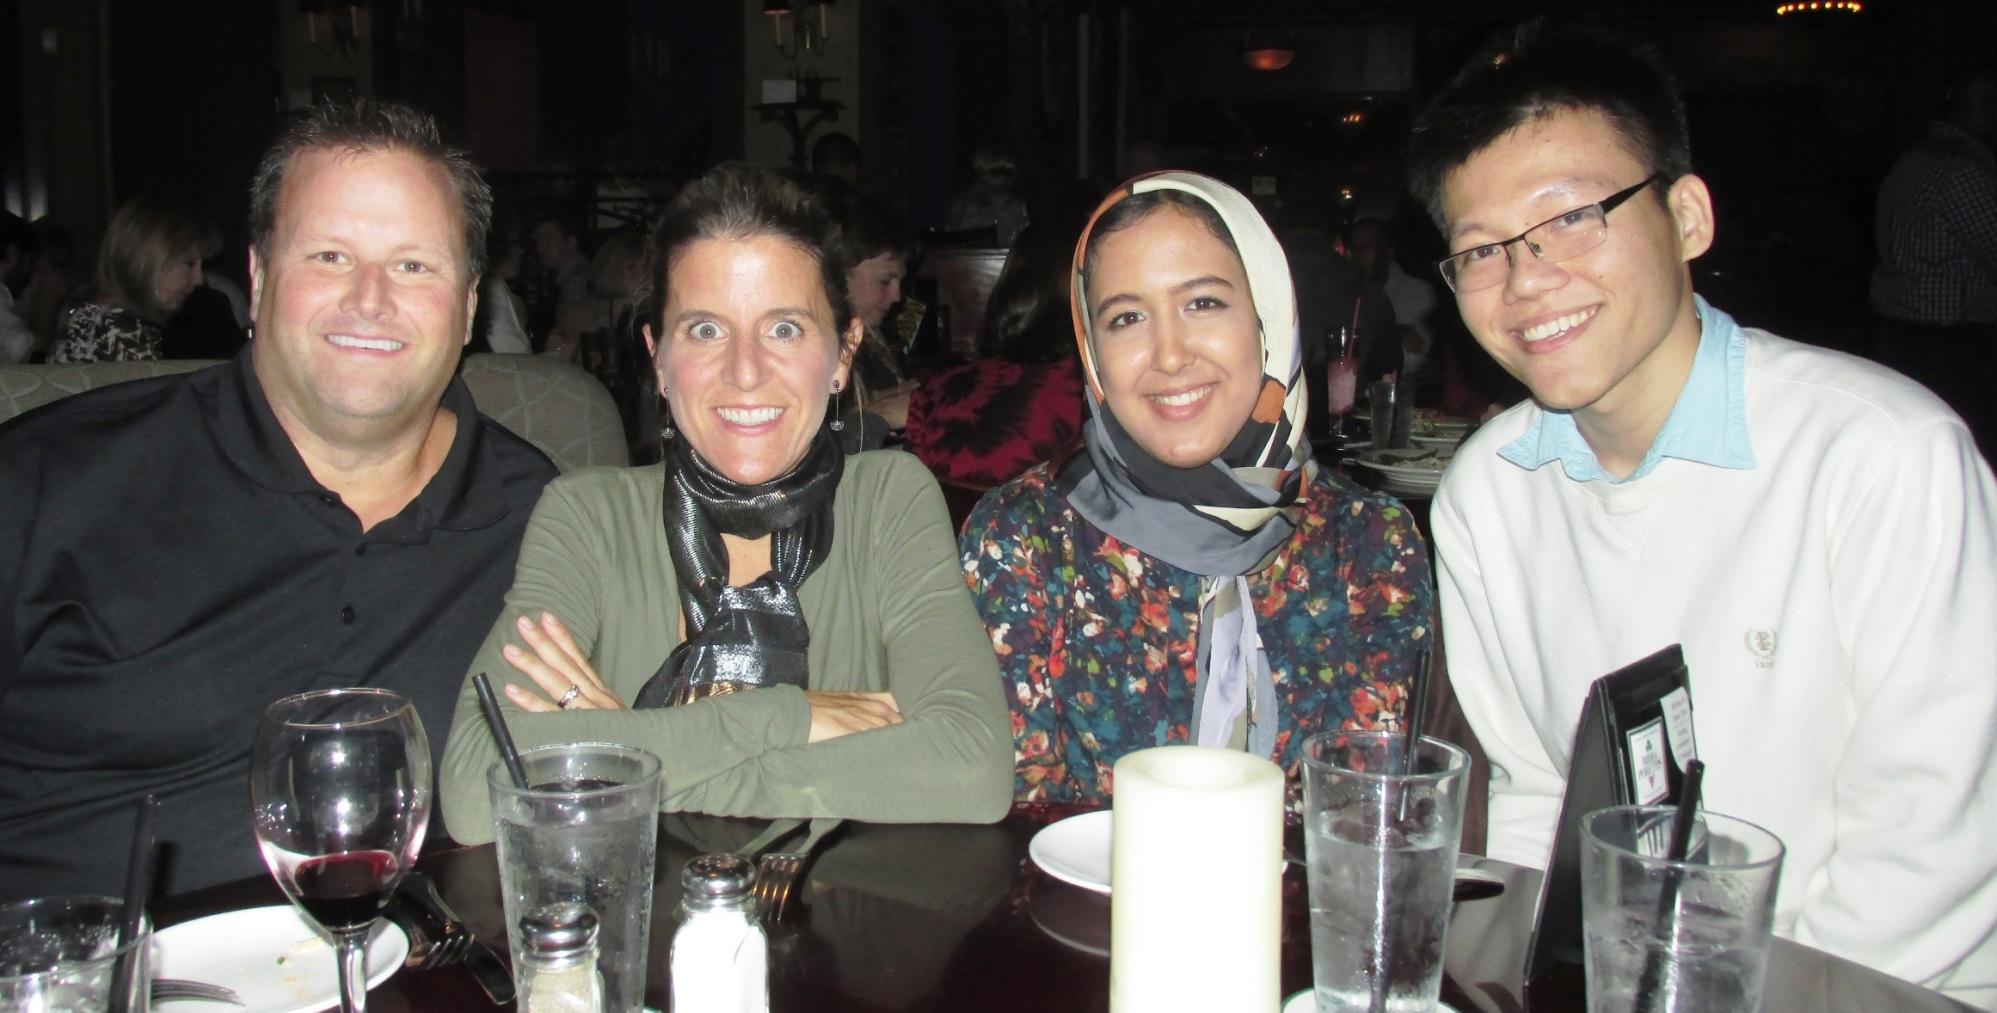 Dinner with U of H Endowment FY2015 Scholarship Winners - Nov 20 2014